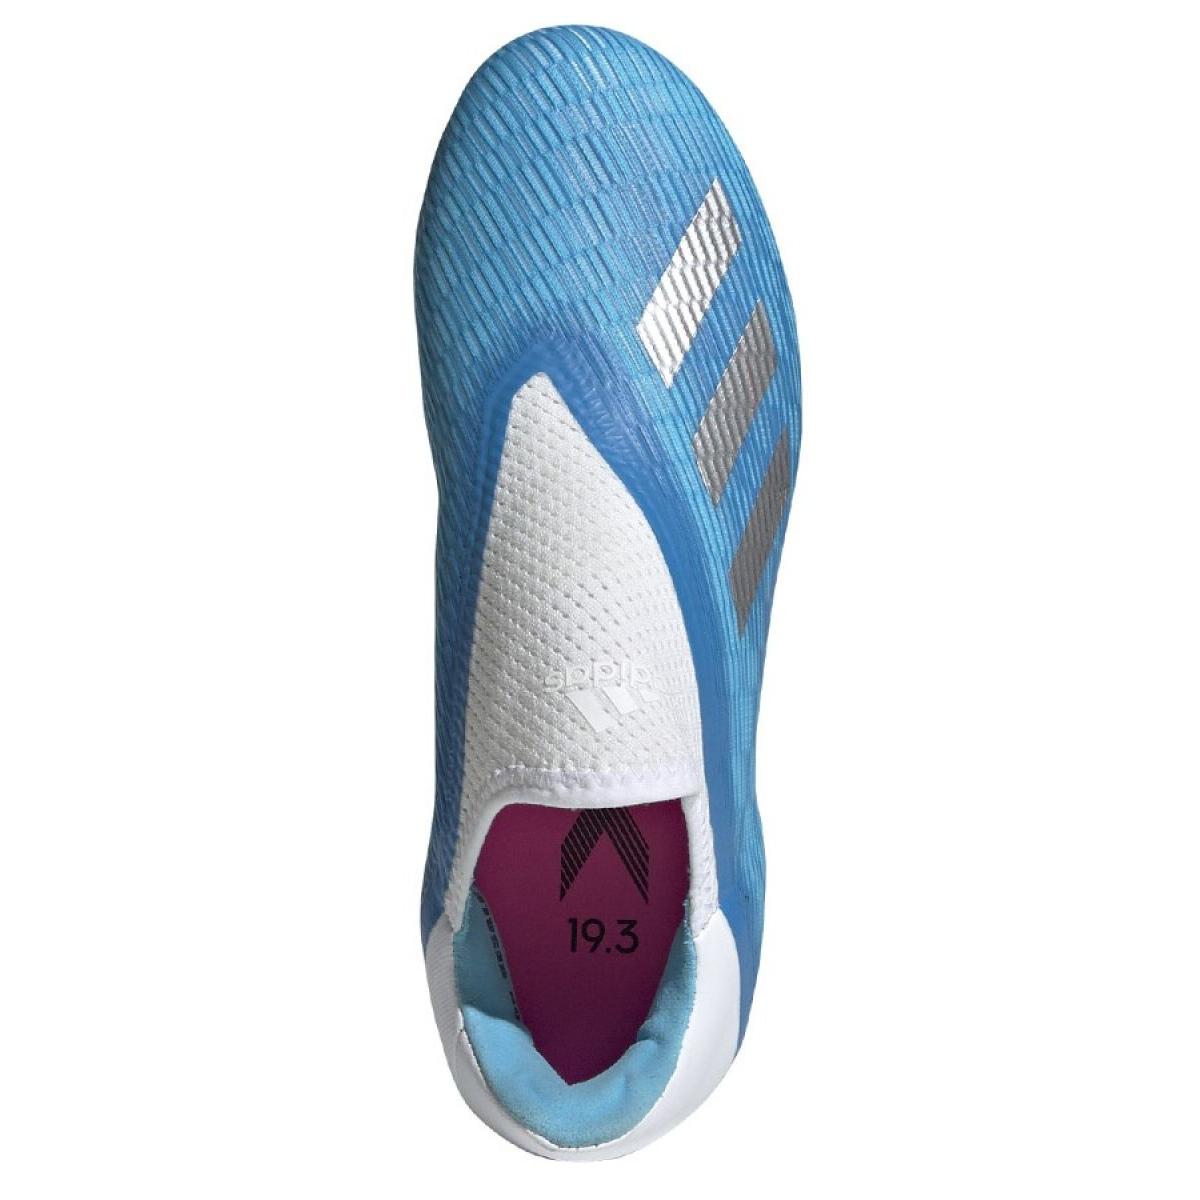 Details about Football shoes adidas X 19.3 Ll Fg Jr EF9114